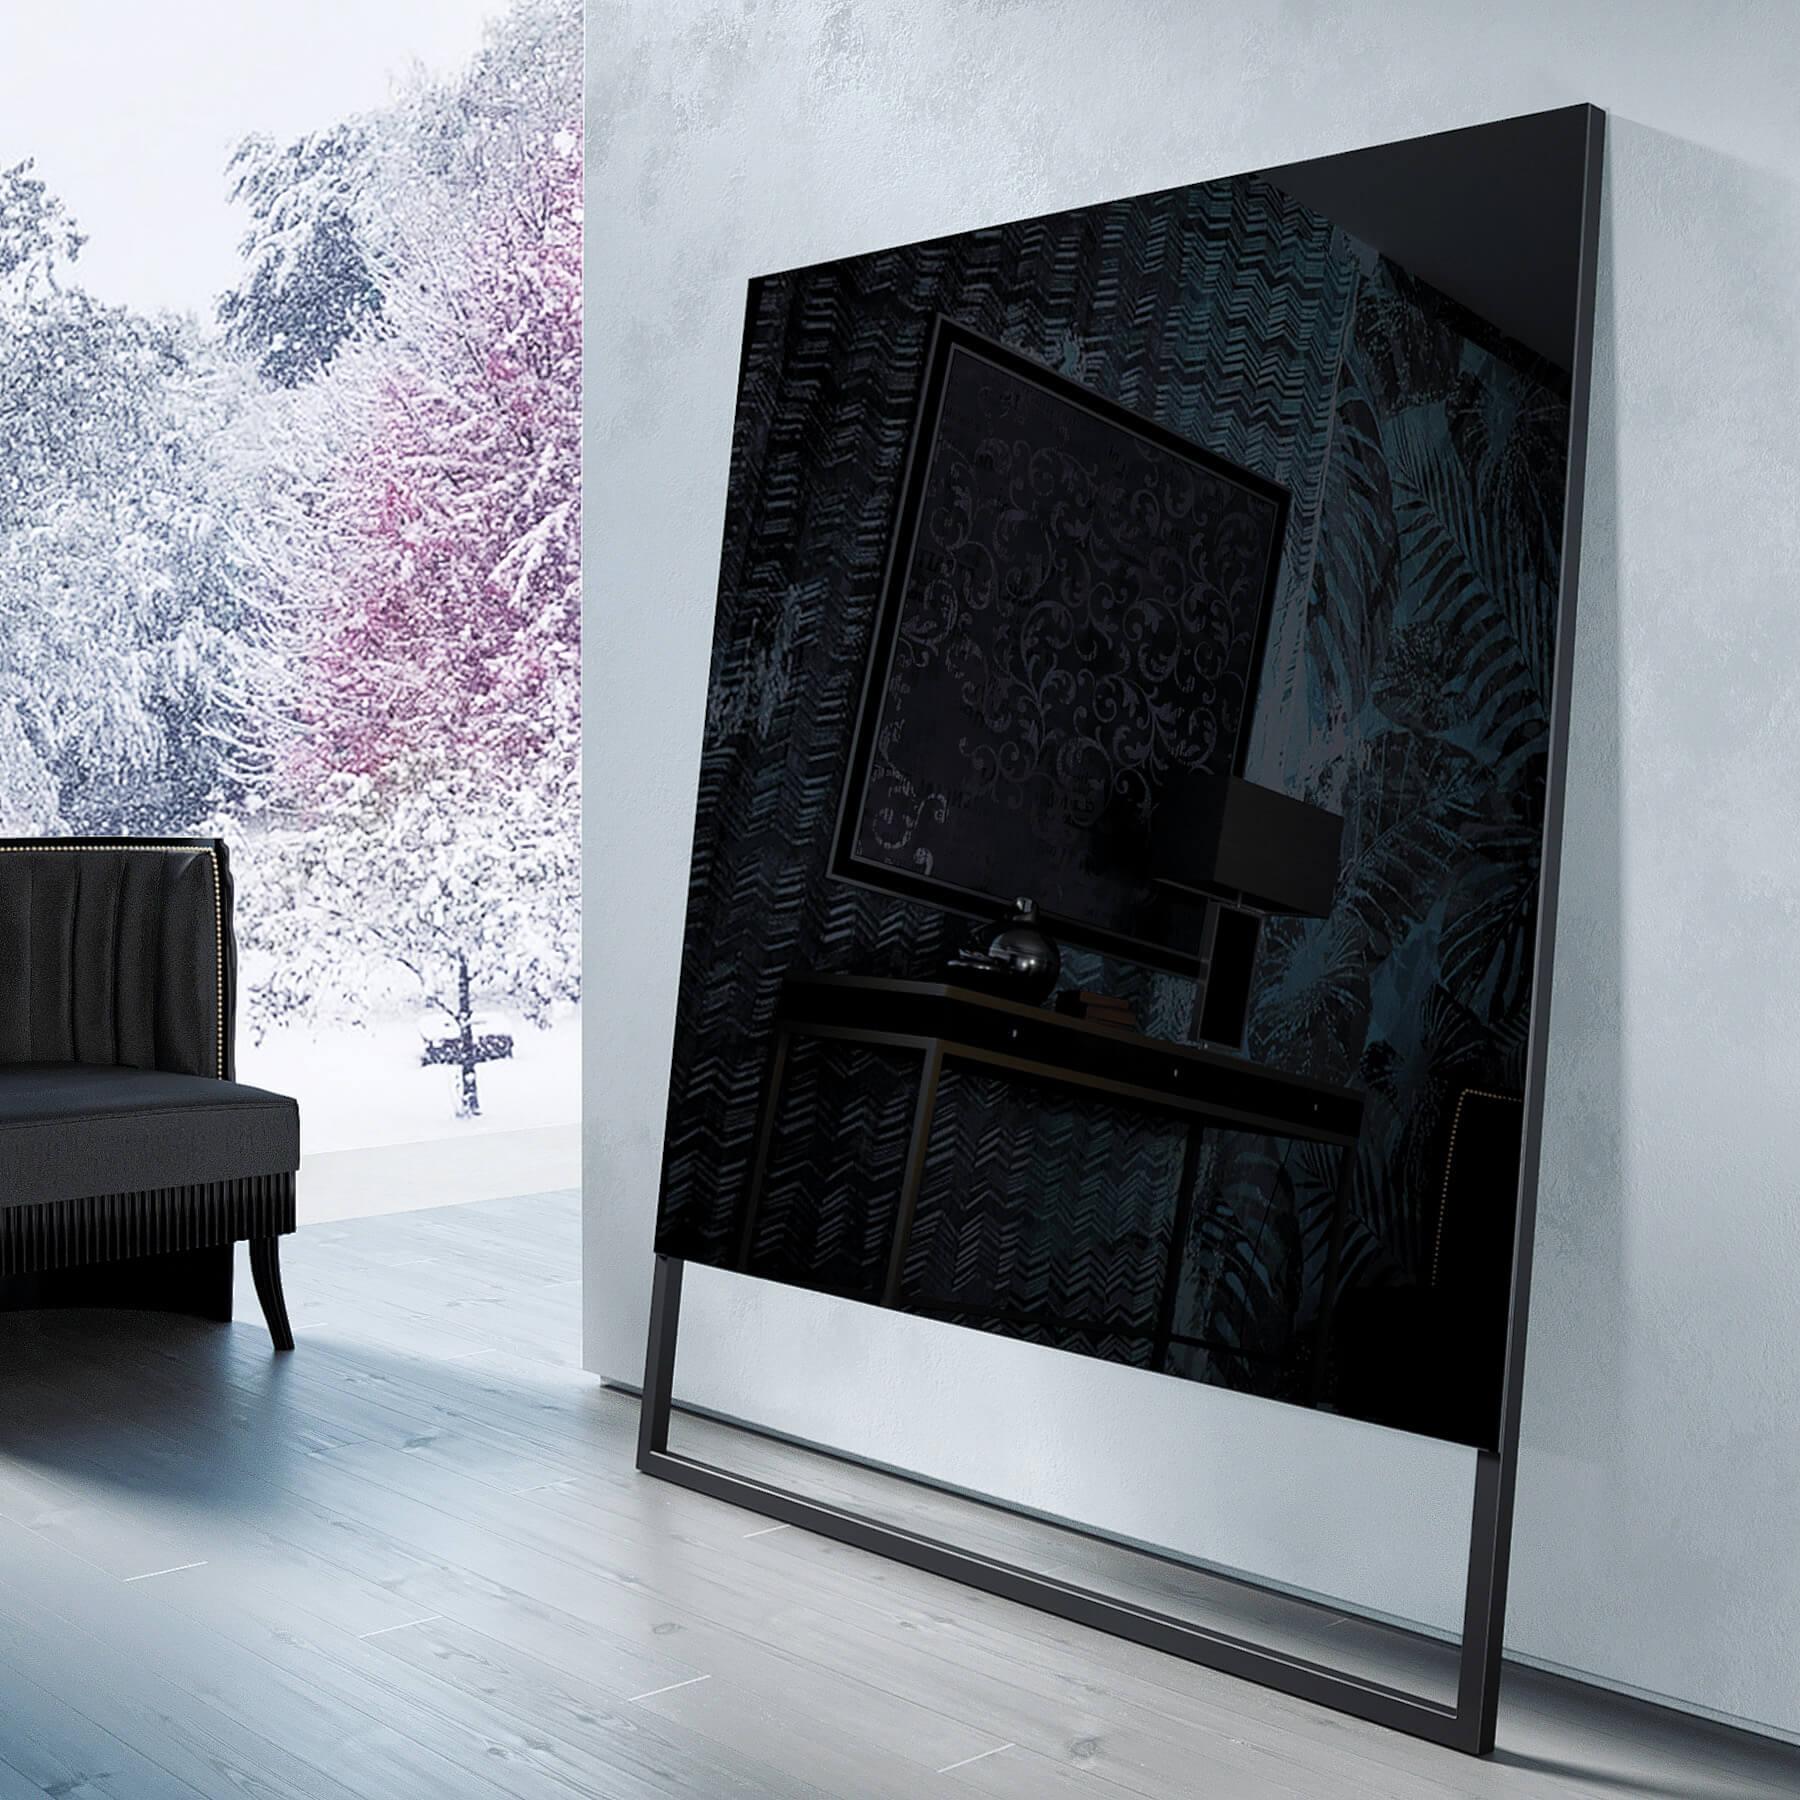 Зеркальный телевизор Tele-Art 49″ Q70SM black glass 1